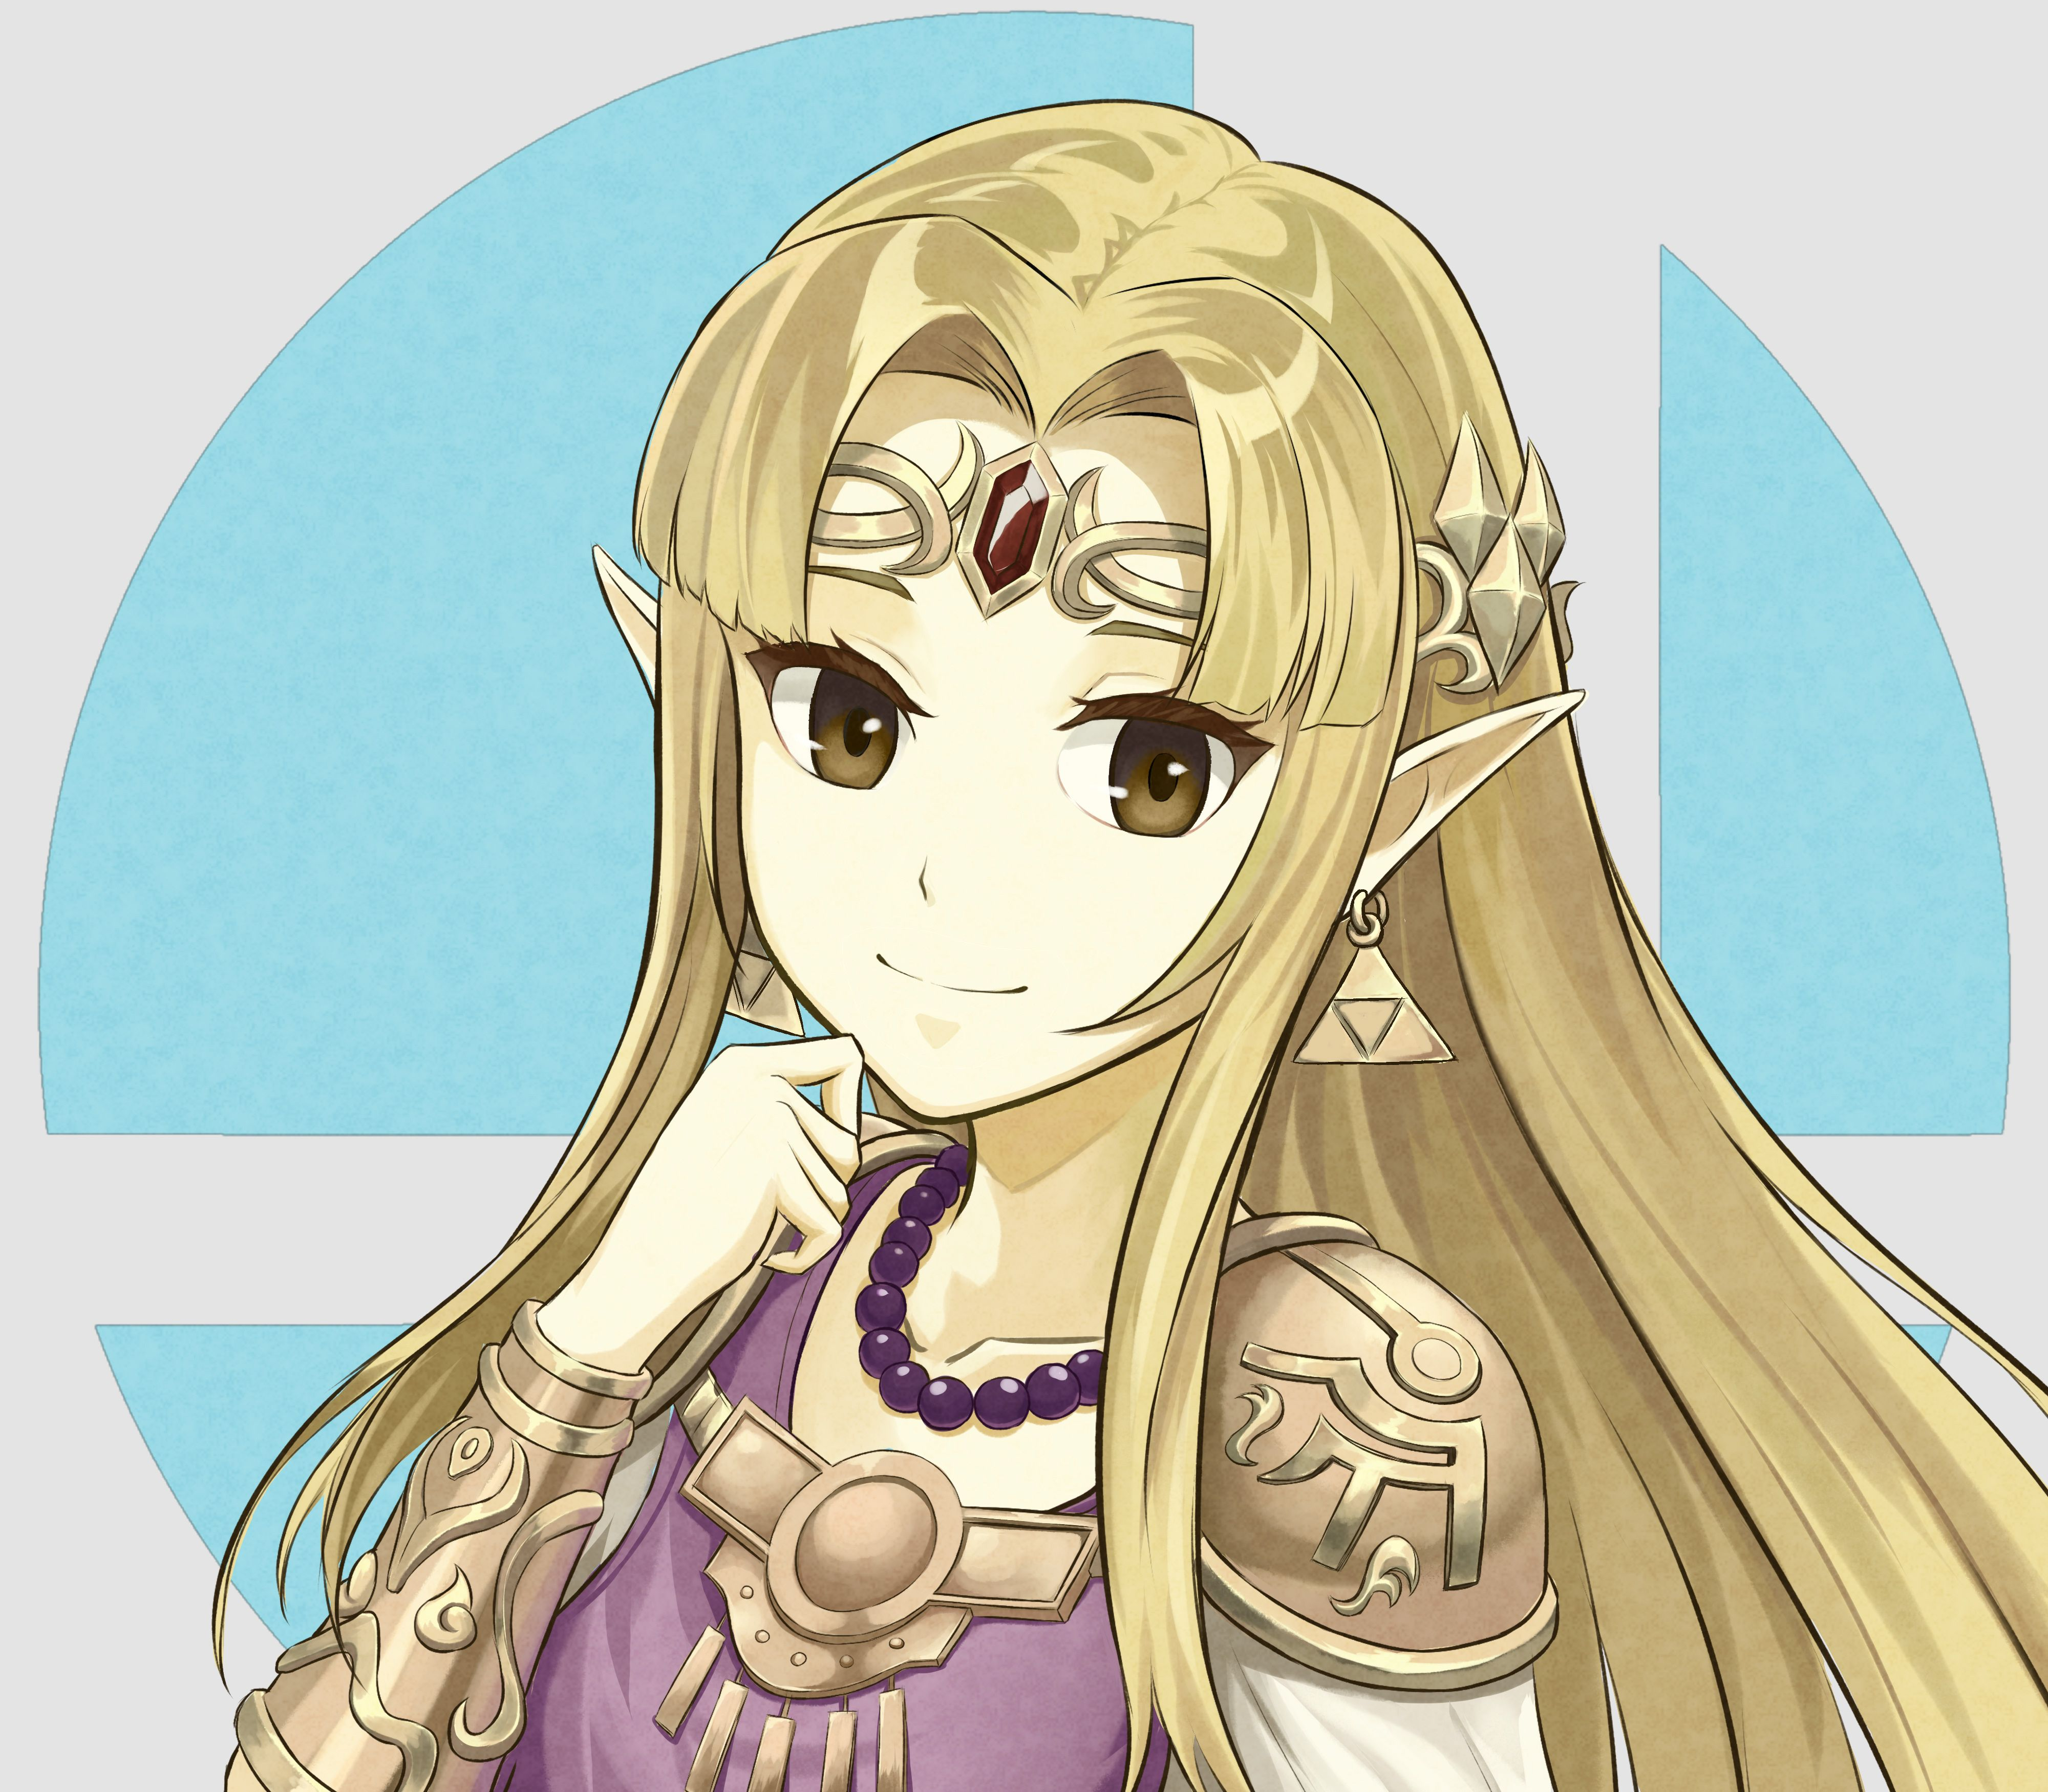 Mm Ideas Princess Drawings Zelda Anime Legend Of Zelda